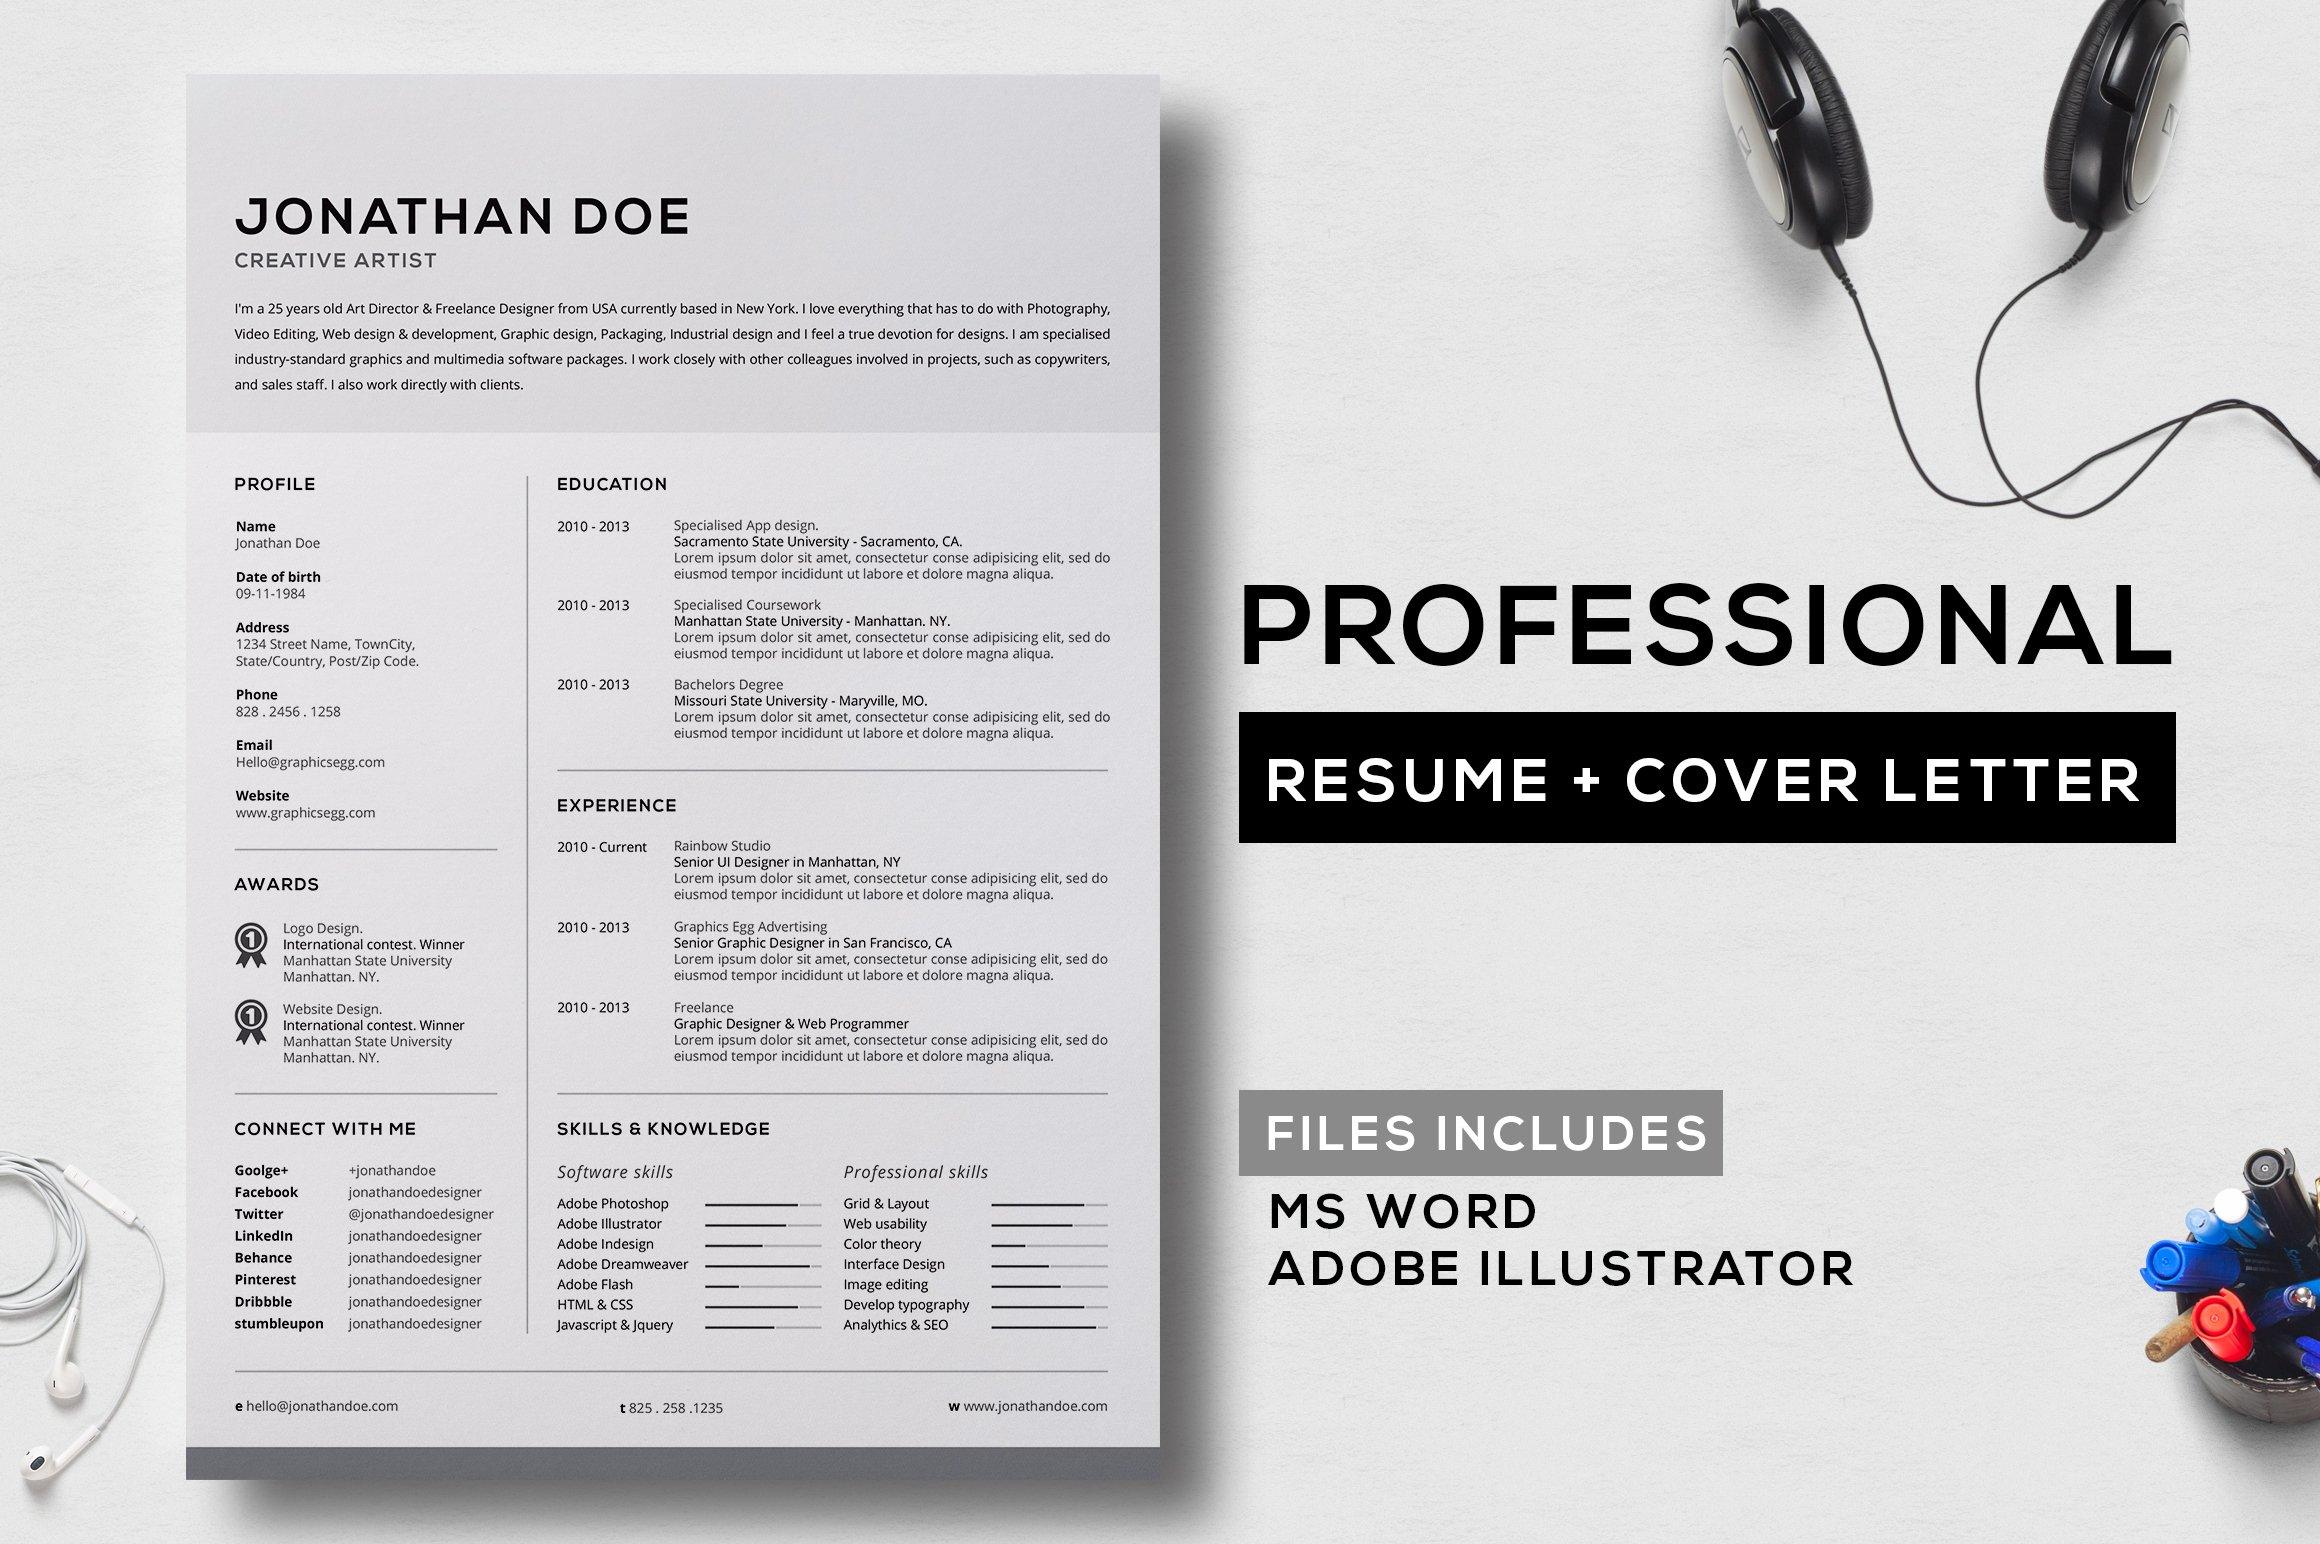 professional-resume-v6-1- Template Cover Letter For Cv Mockup Resume Xlsdxj on